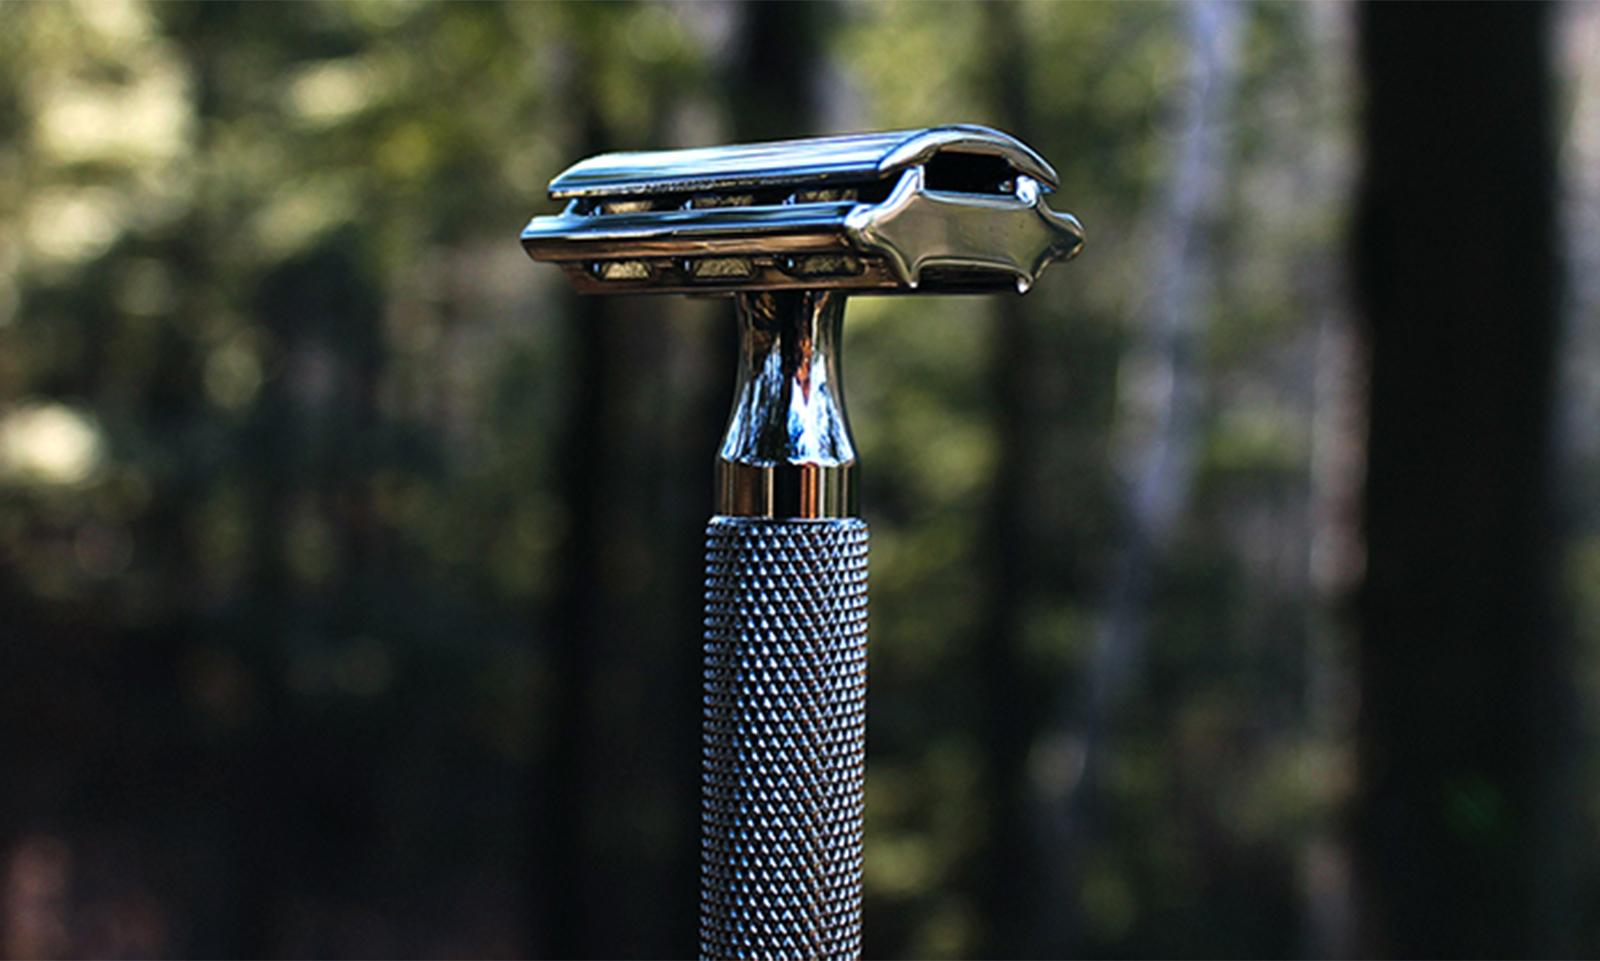 22-01-2019-kies de safety razor die bij jou past-web